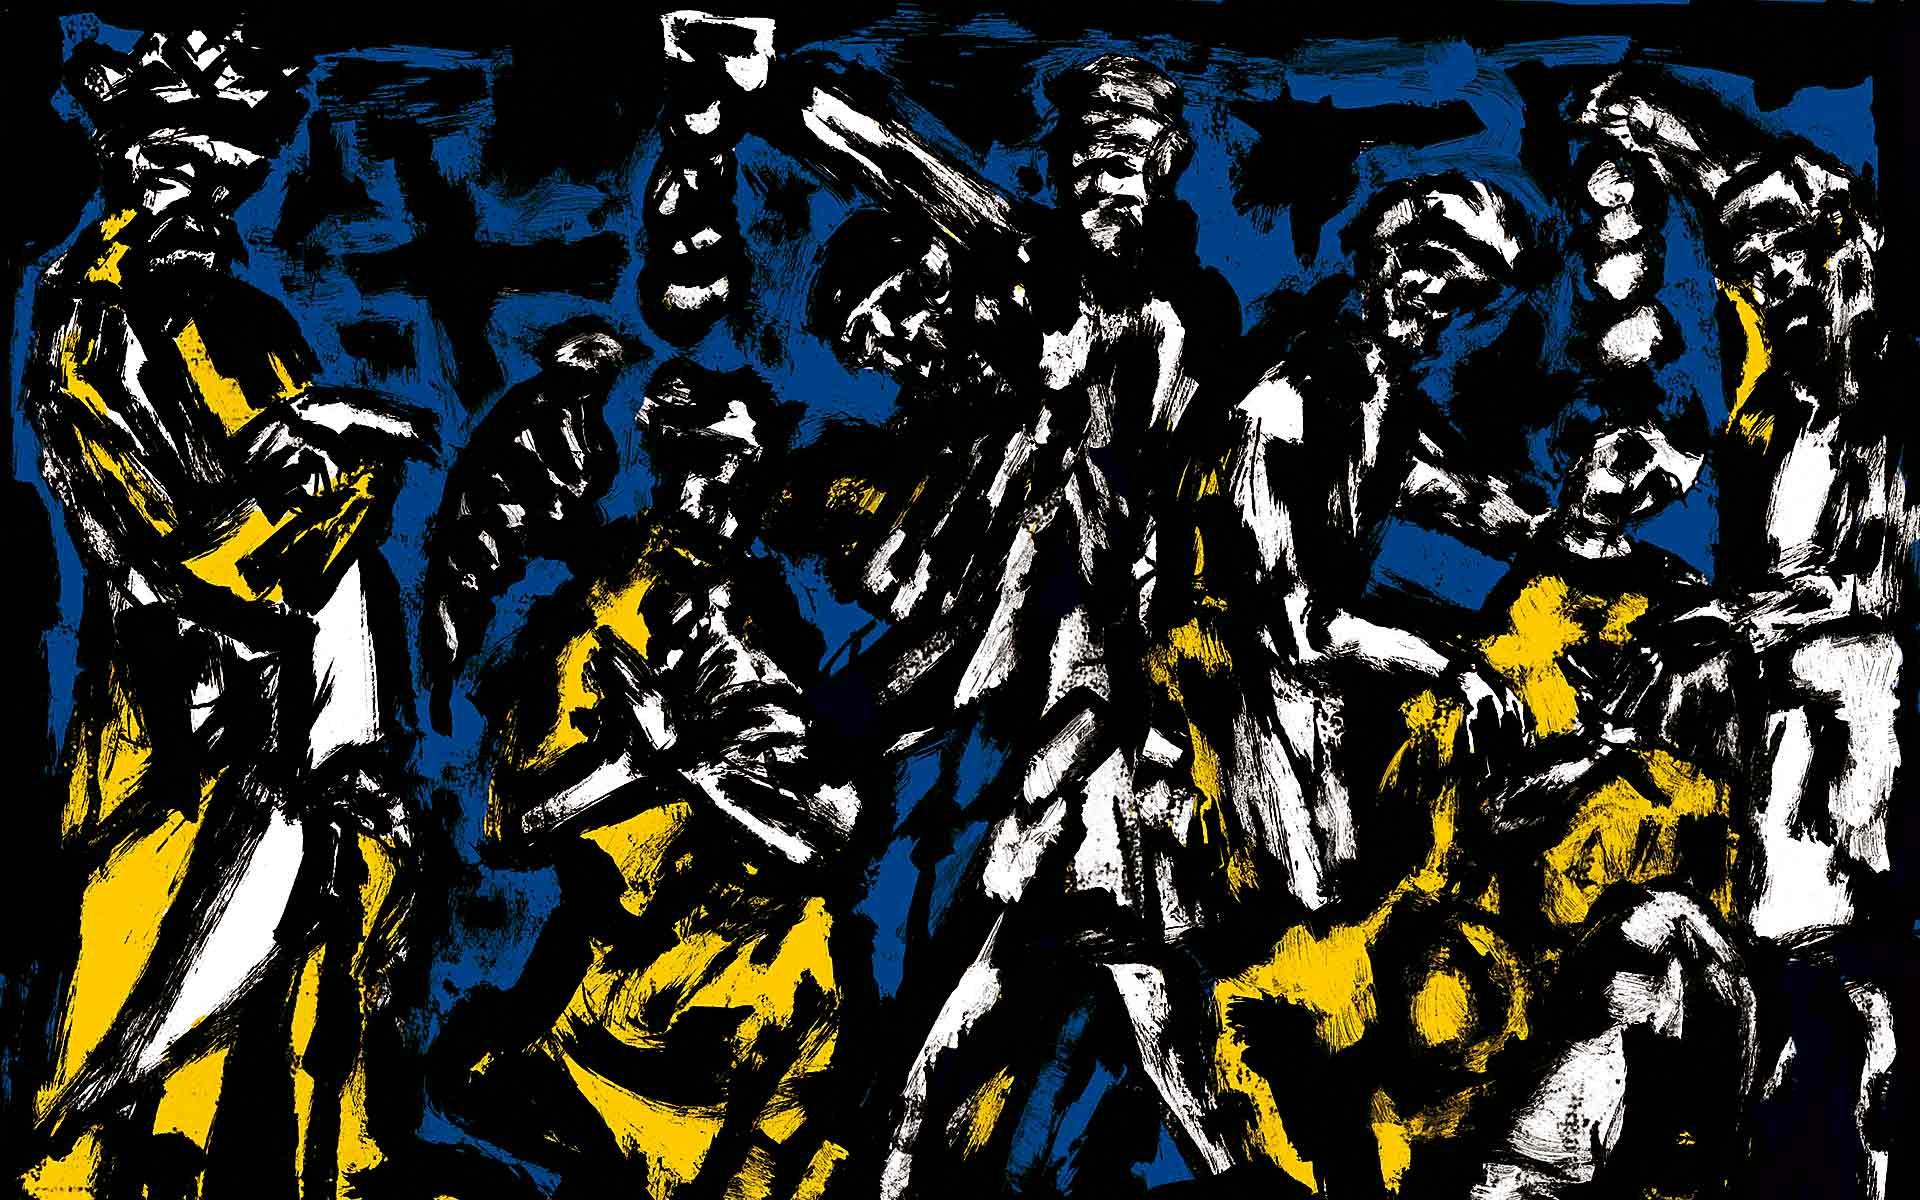 Norbert Klora Crusade Digital Printing on Paper, Exhibition Criss-Cross